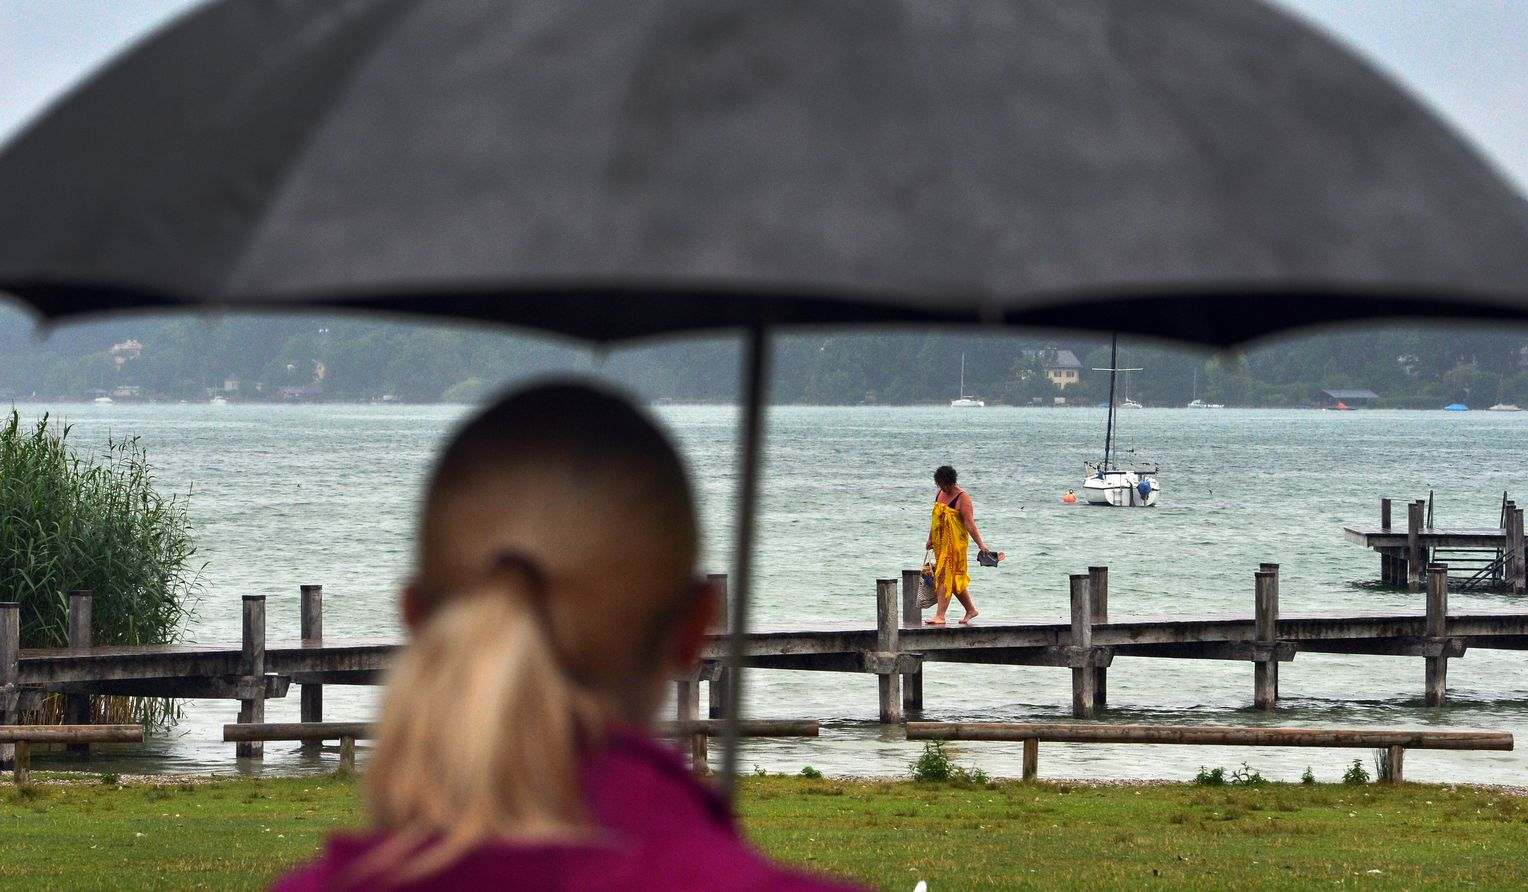 Unwetterwarnung: Unwetterzentrale kündigt lokale Gewitter